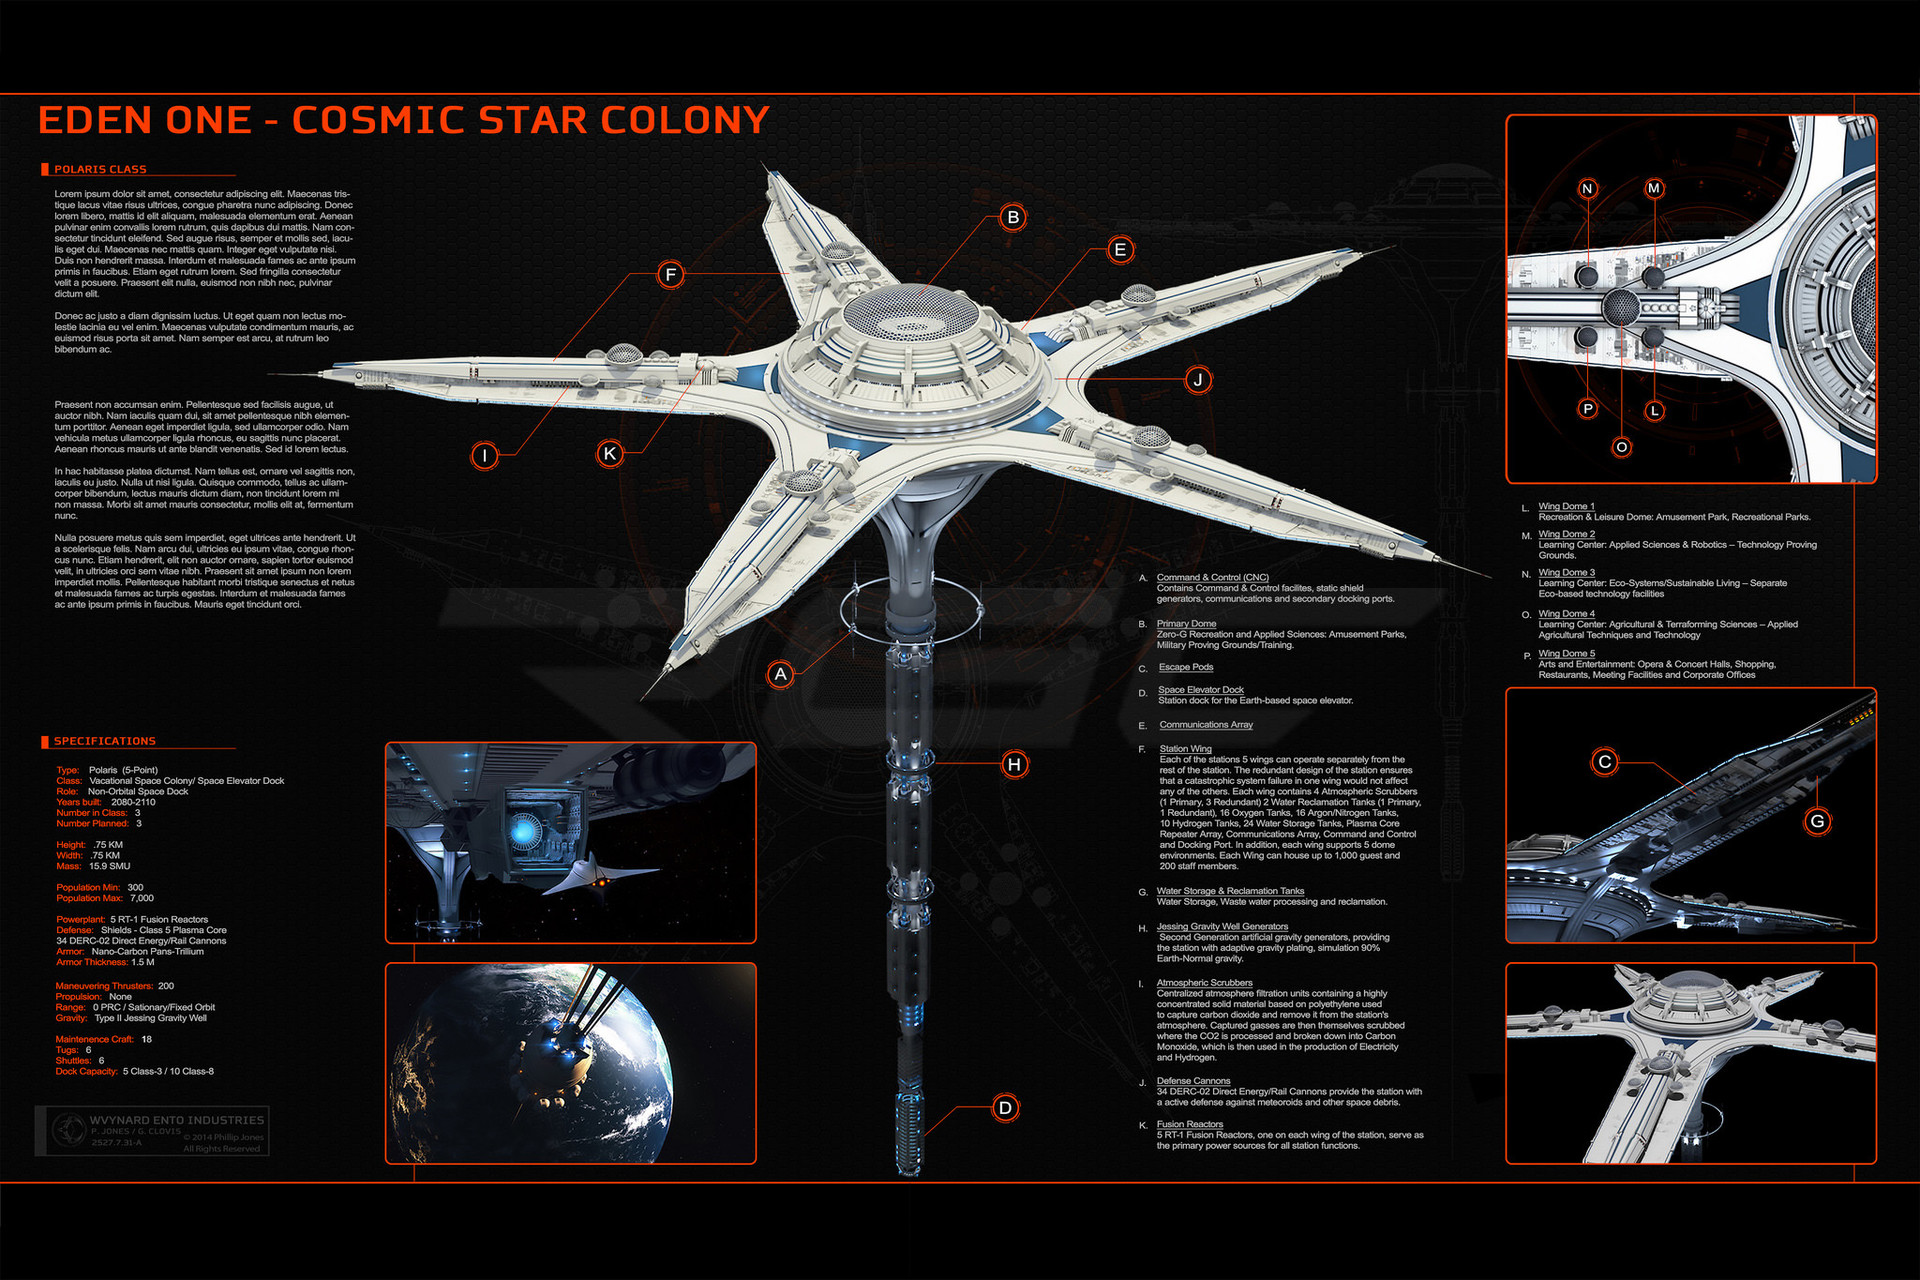 Glenn clovis commission project eden one space station by glennclovis